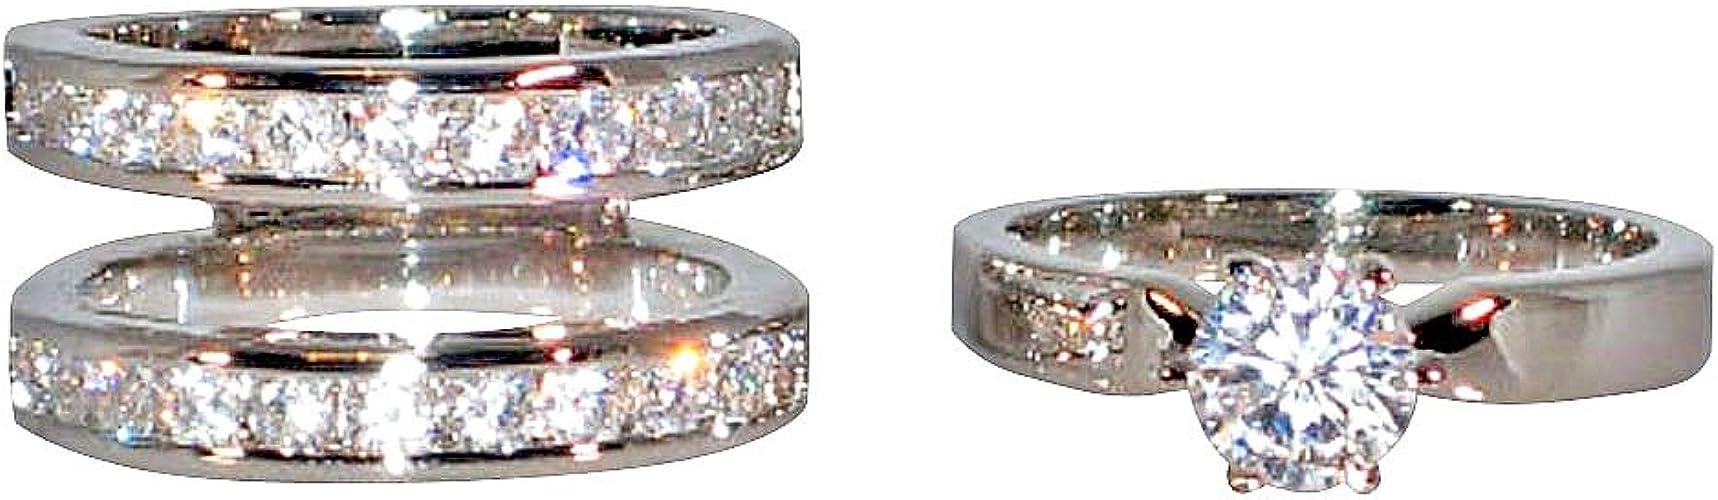 Bridal Ring Bling J18 product image 5